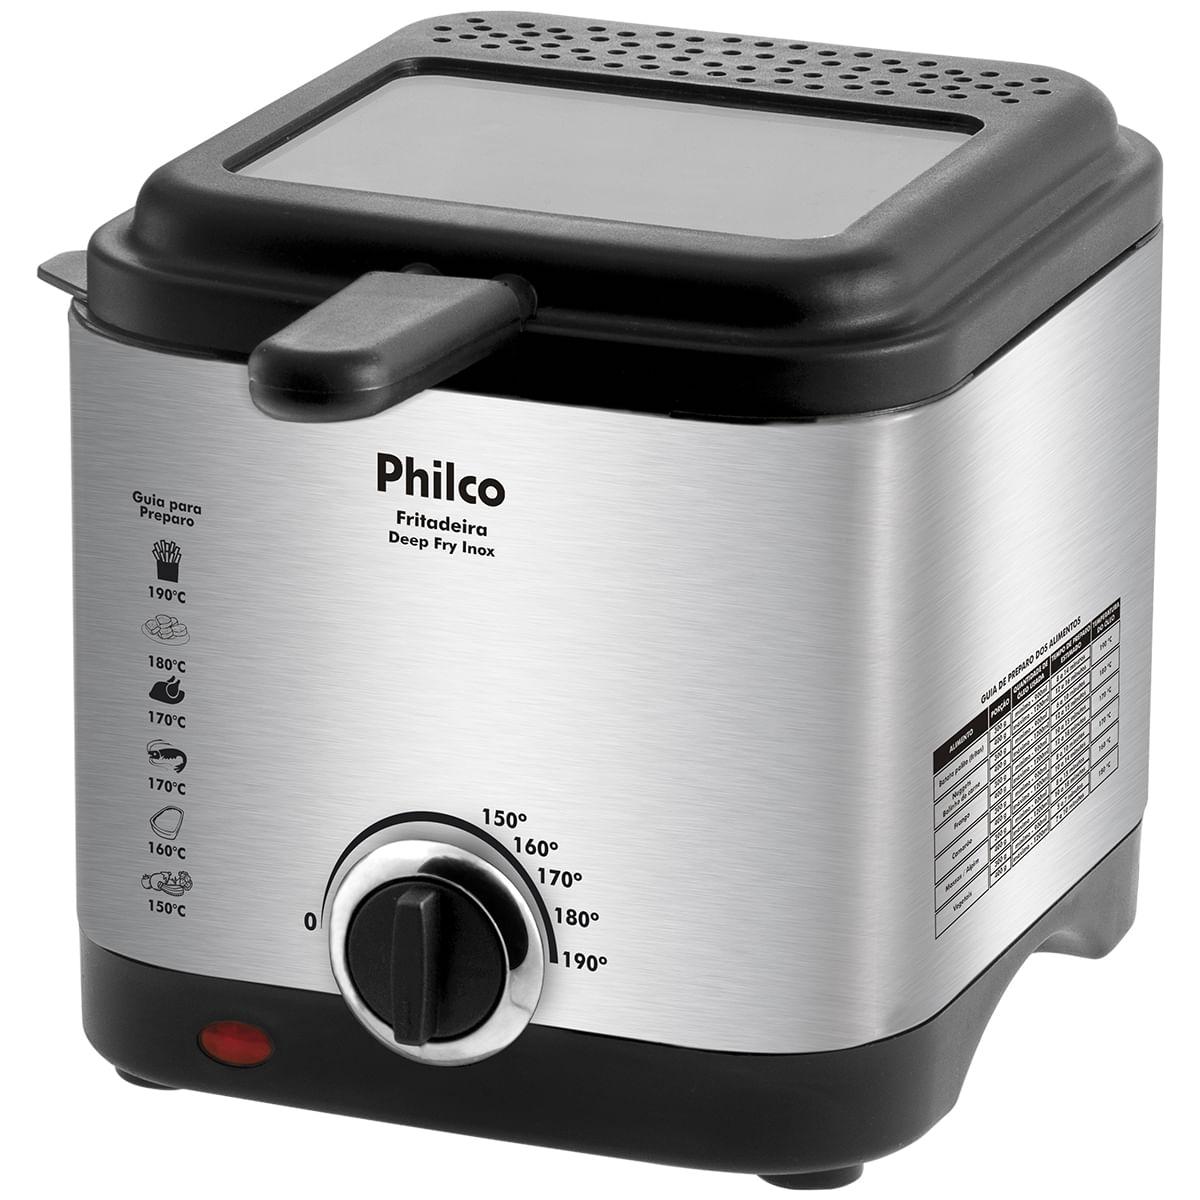 Fritadeira Philco Deep Fry Inox 1,8L